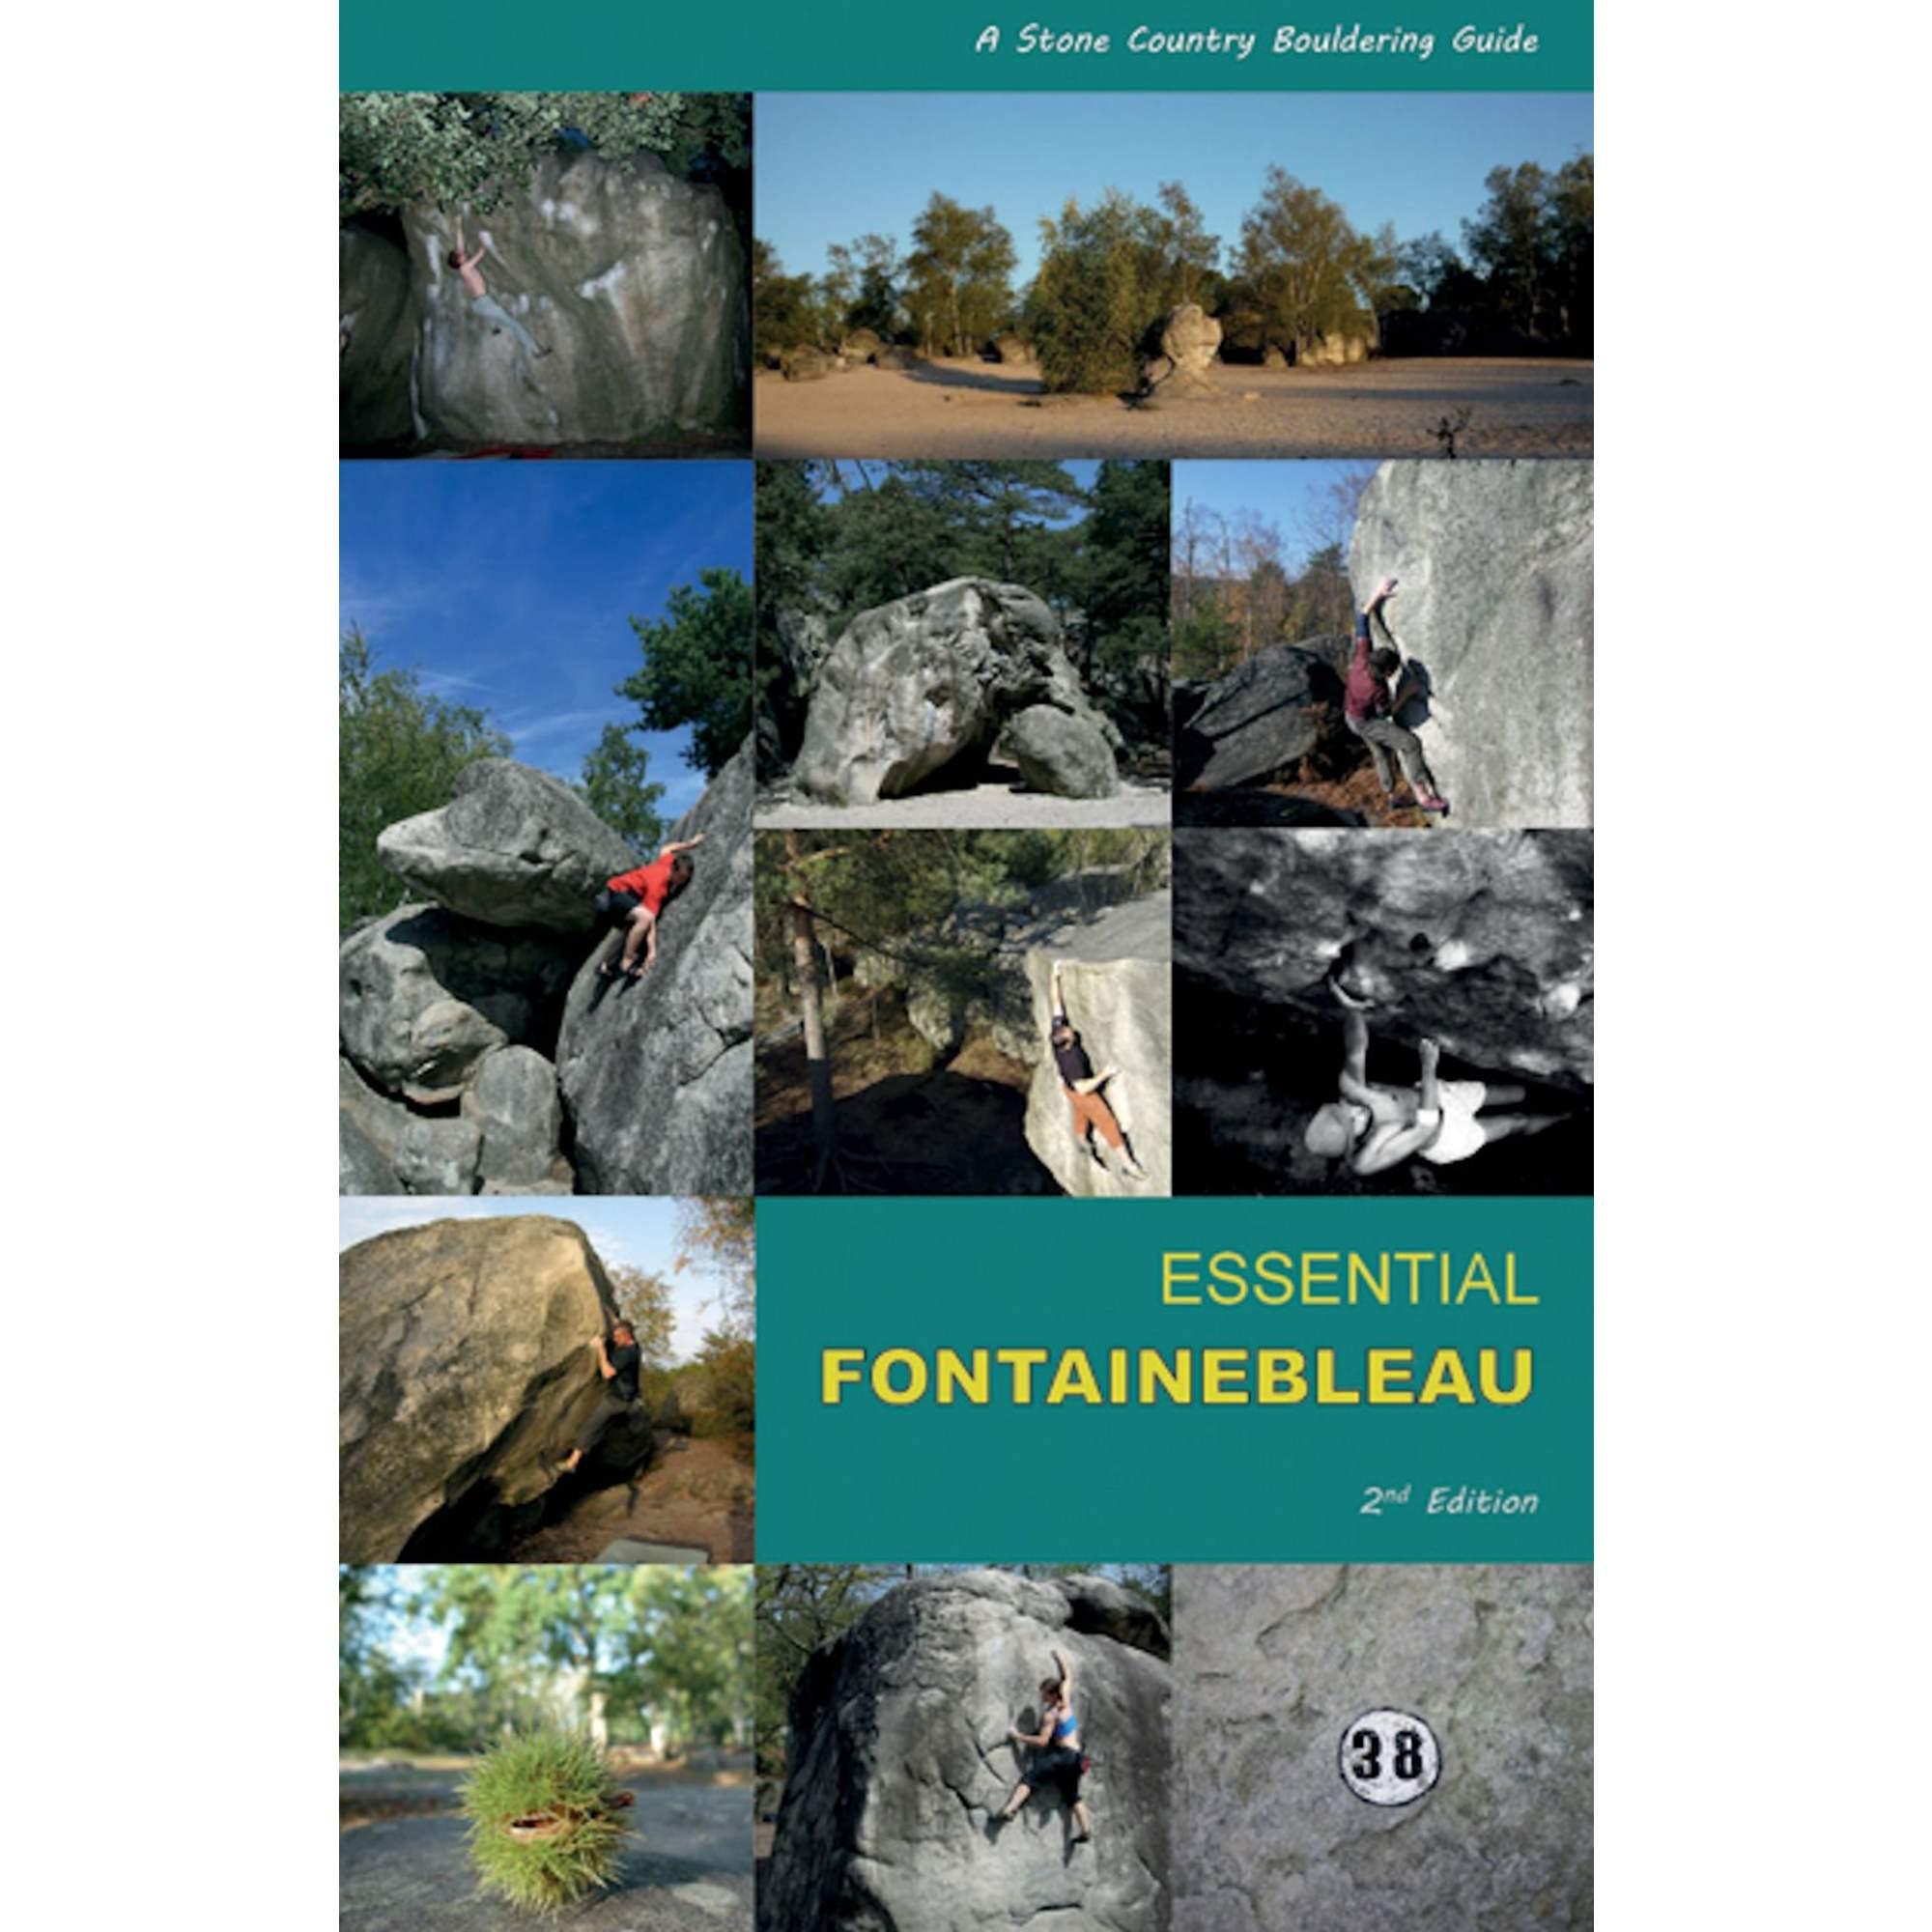 Essential Fontainebleau, 14,95 Euro